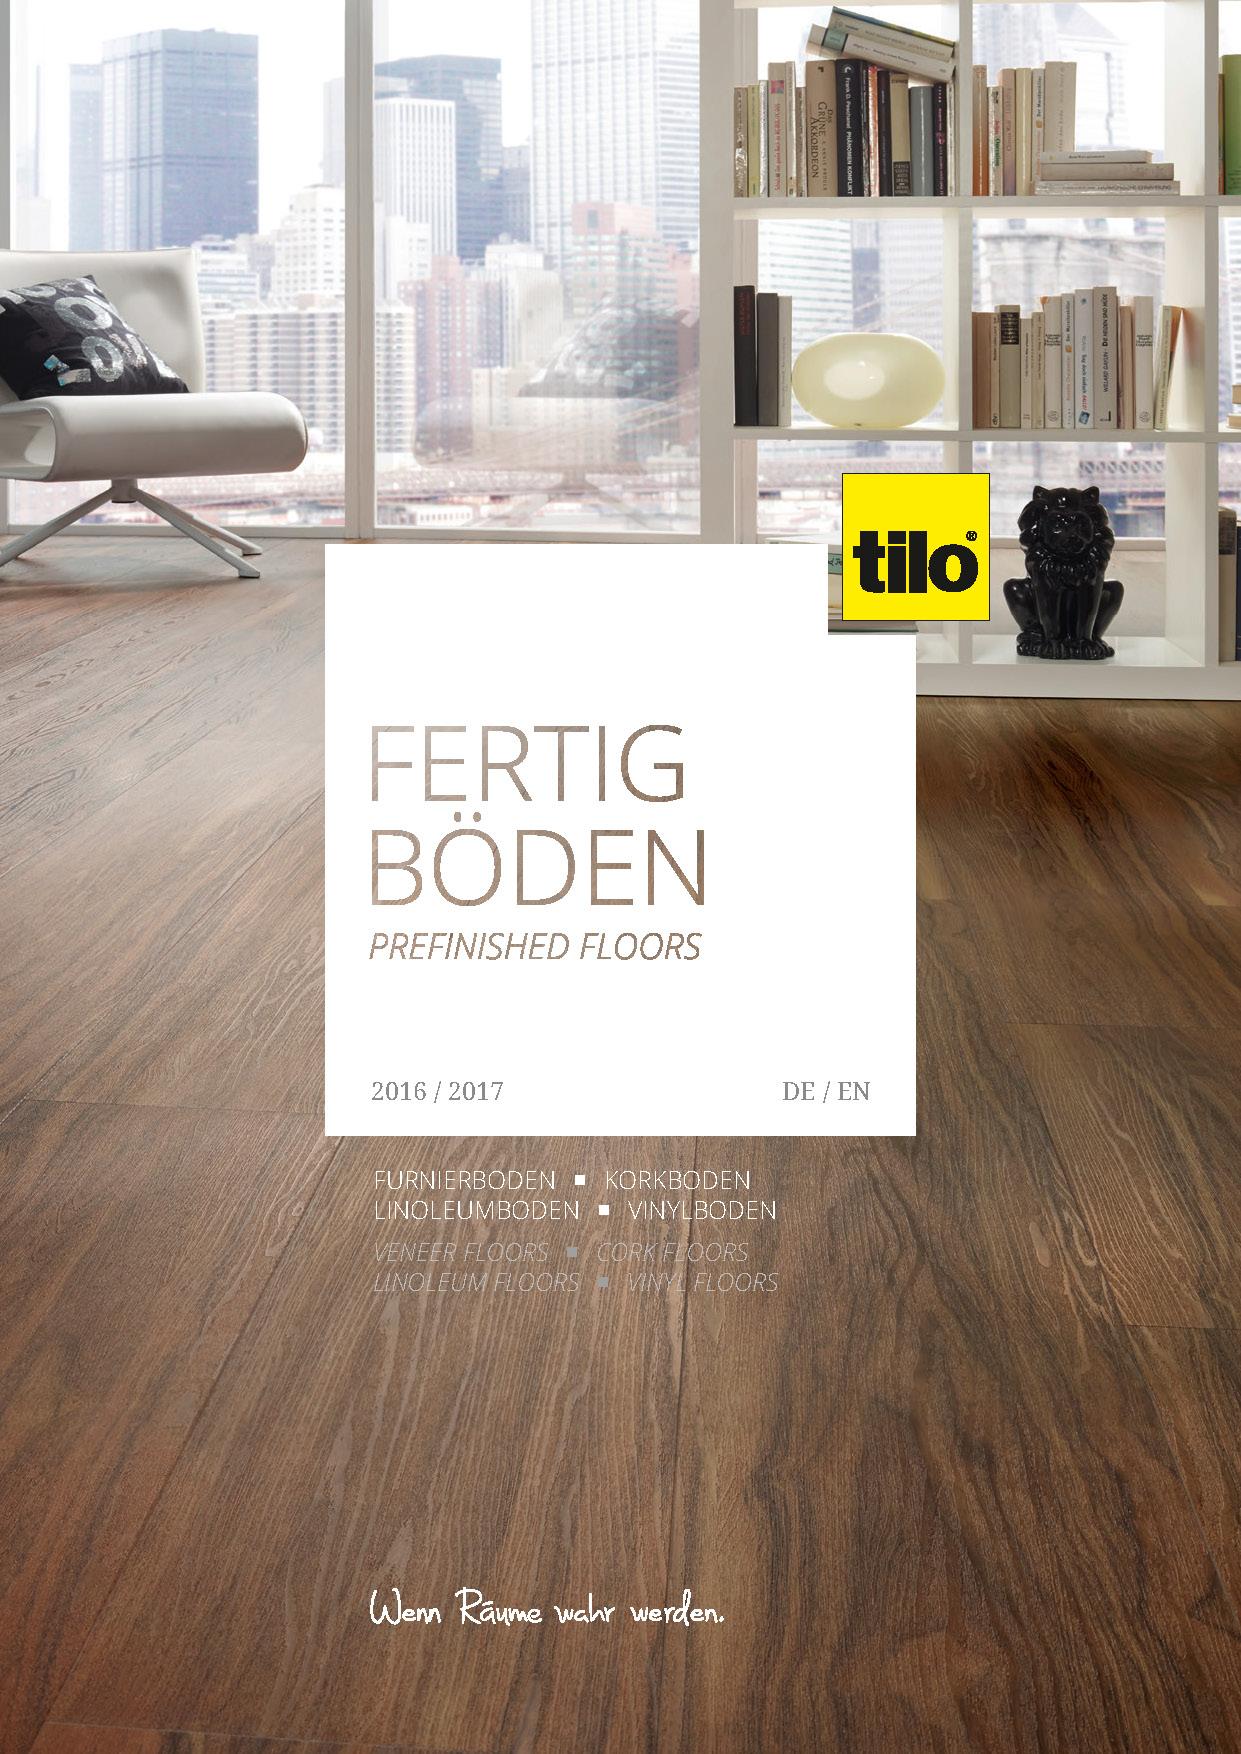 laminat boden terrasse garten t ren hohenfurch schongau peiting landsberg kataloge online. Black Bedroom Furniture Sets. Home Design Ideas